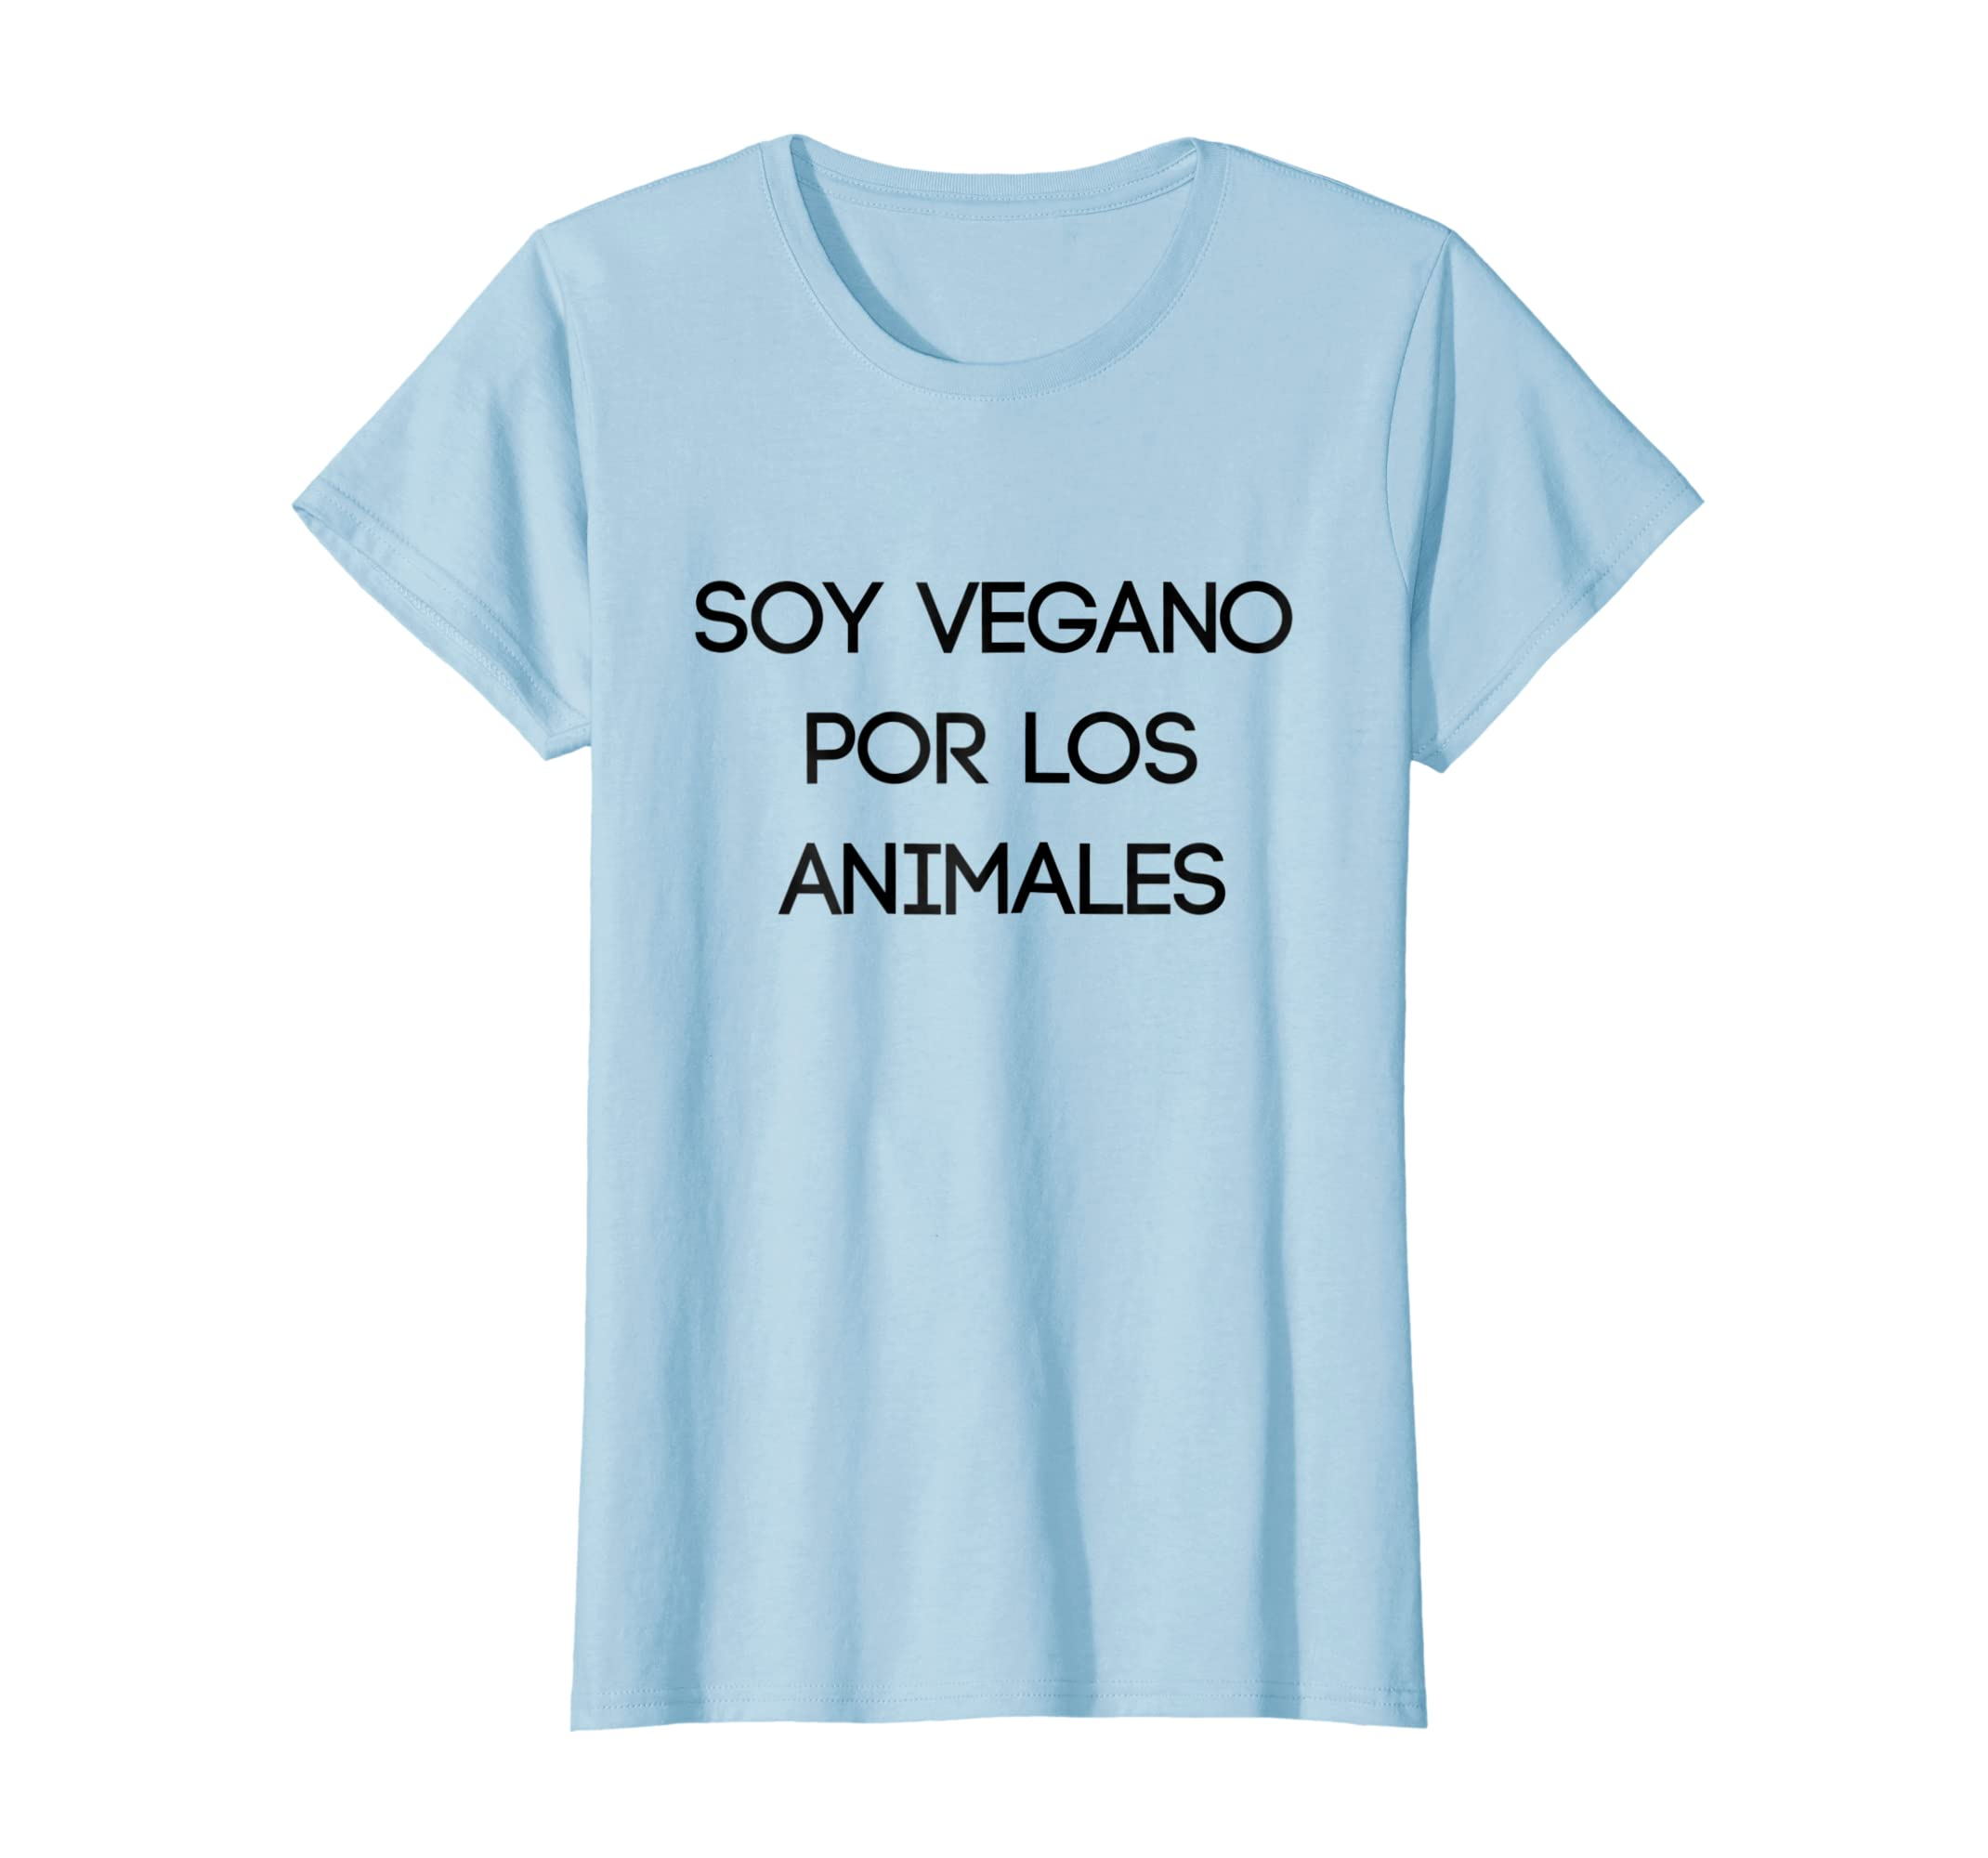 Amazon.com: Soy vegano por los animales ropa vegana shirt camisa: Clothing